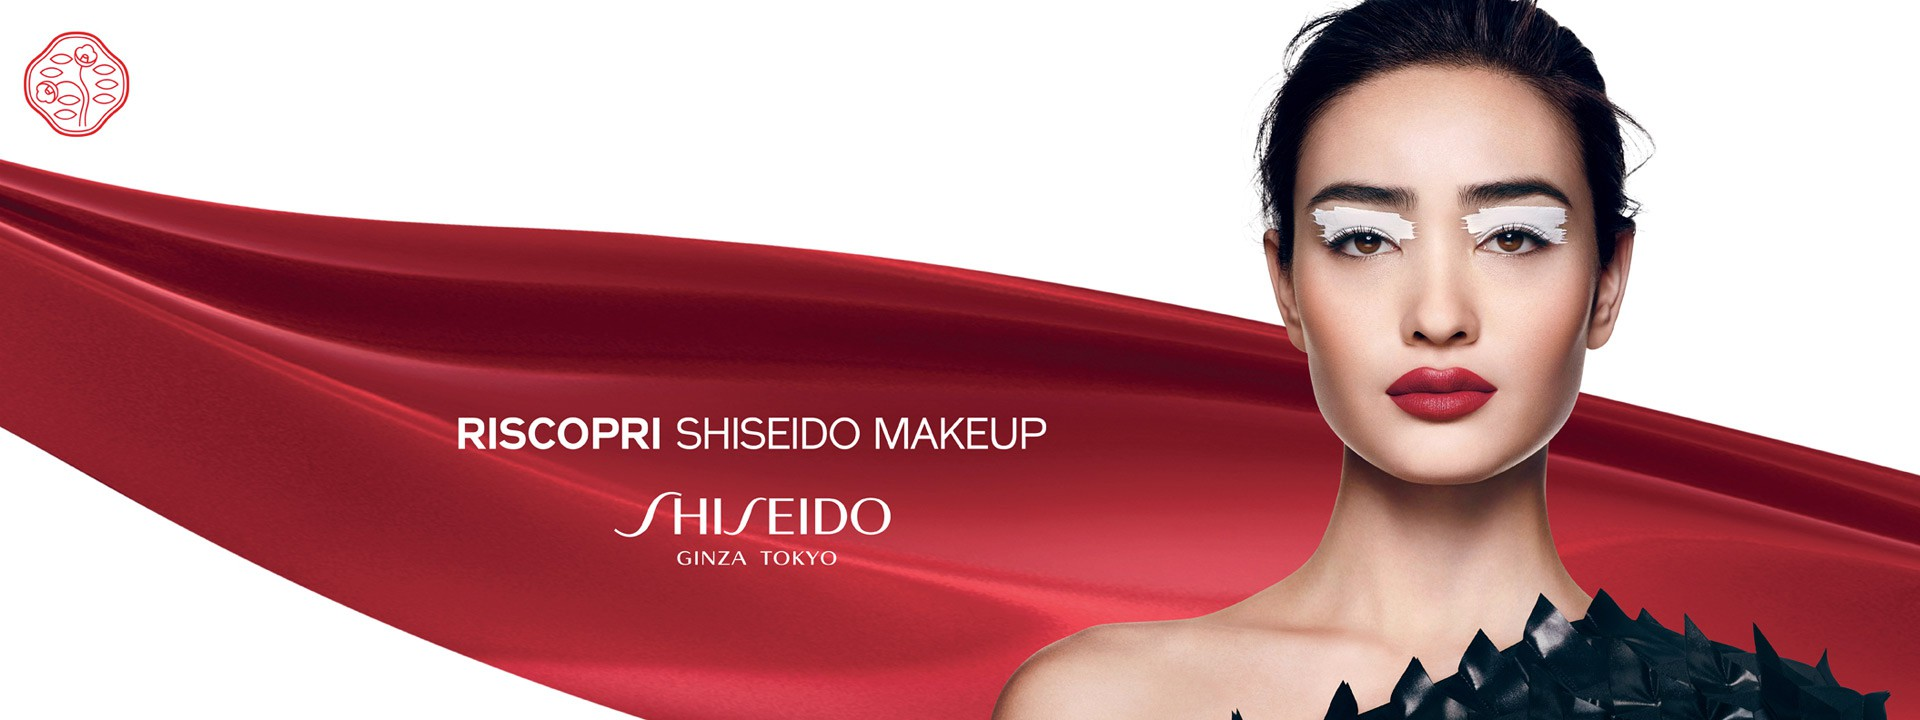 shiseido nuovo make-up